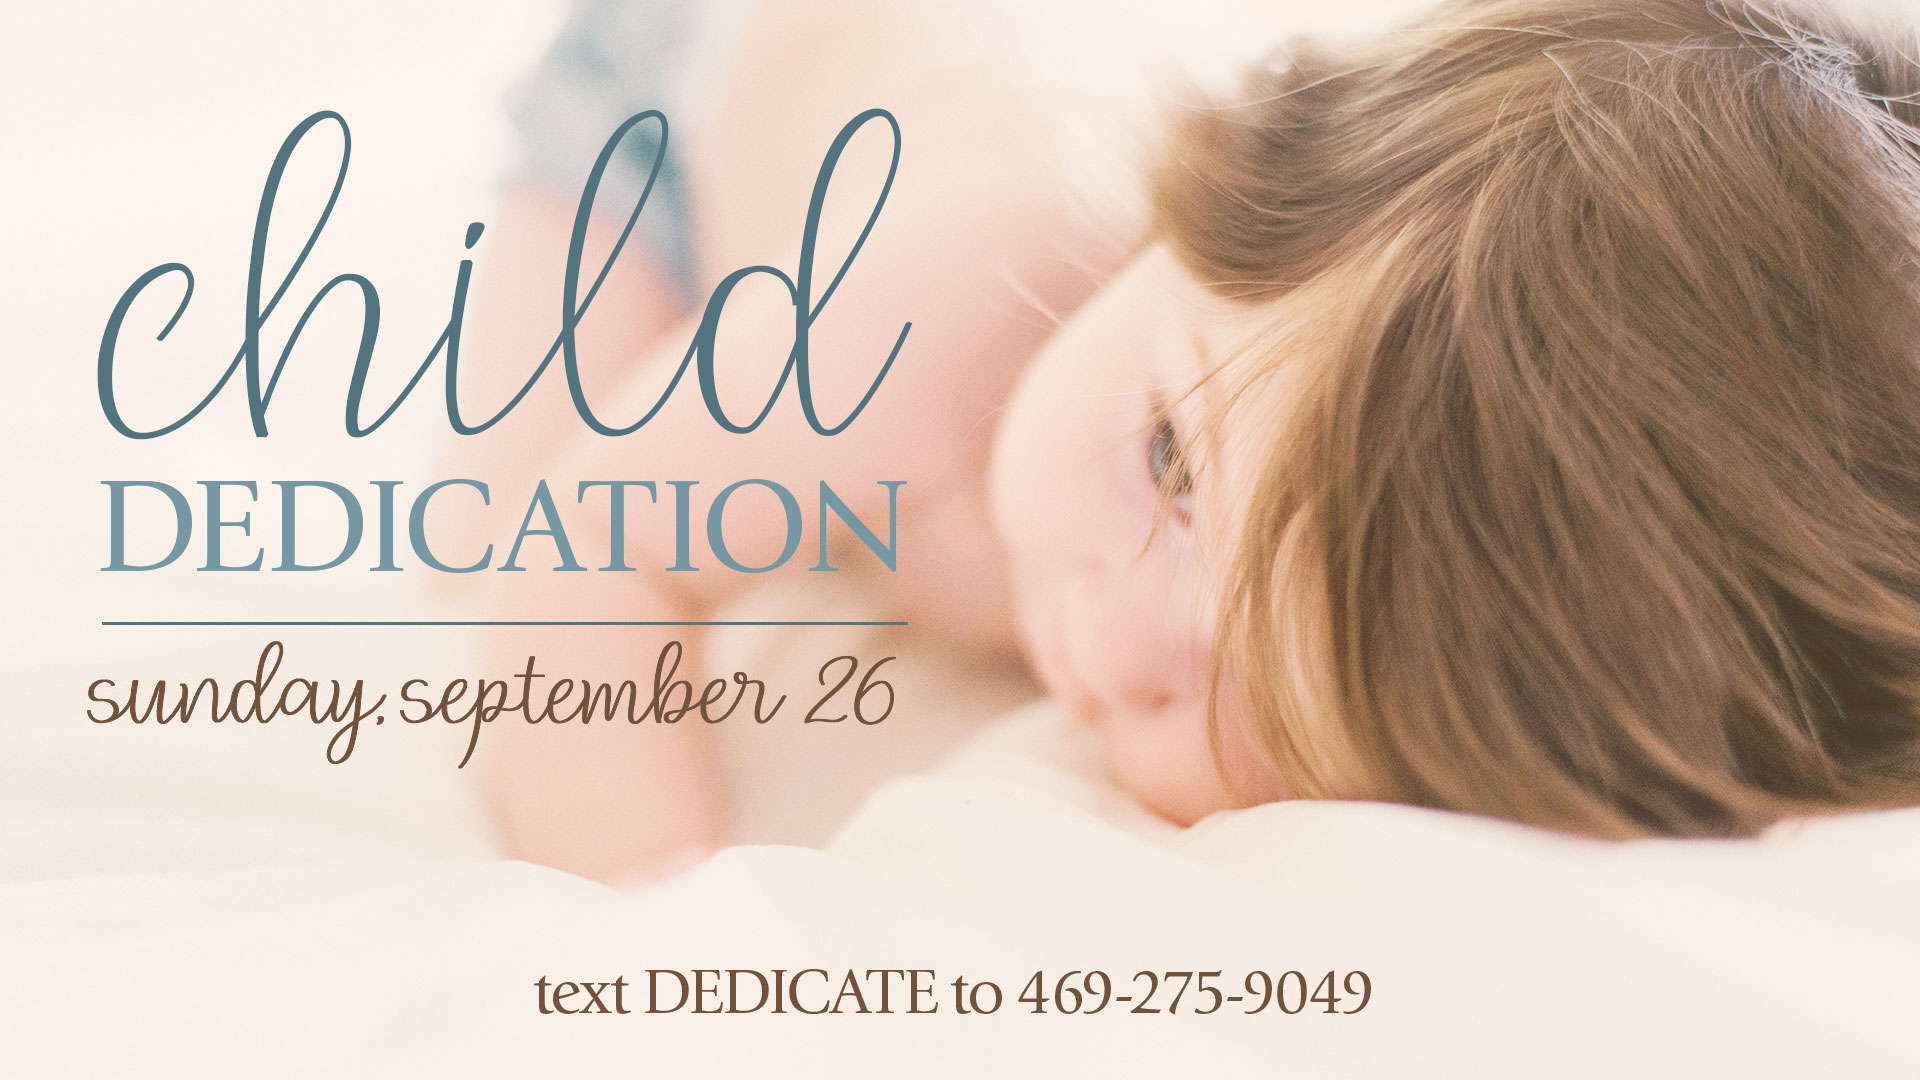 Child Dedication: February 28, 2021